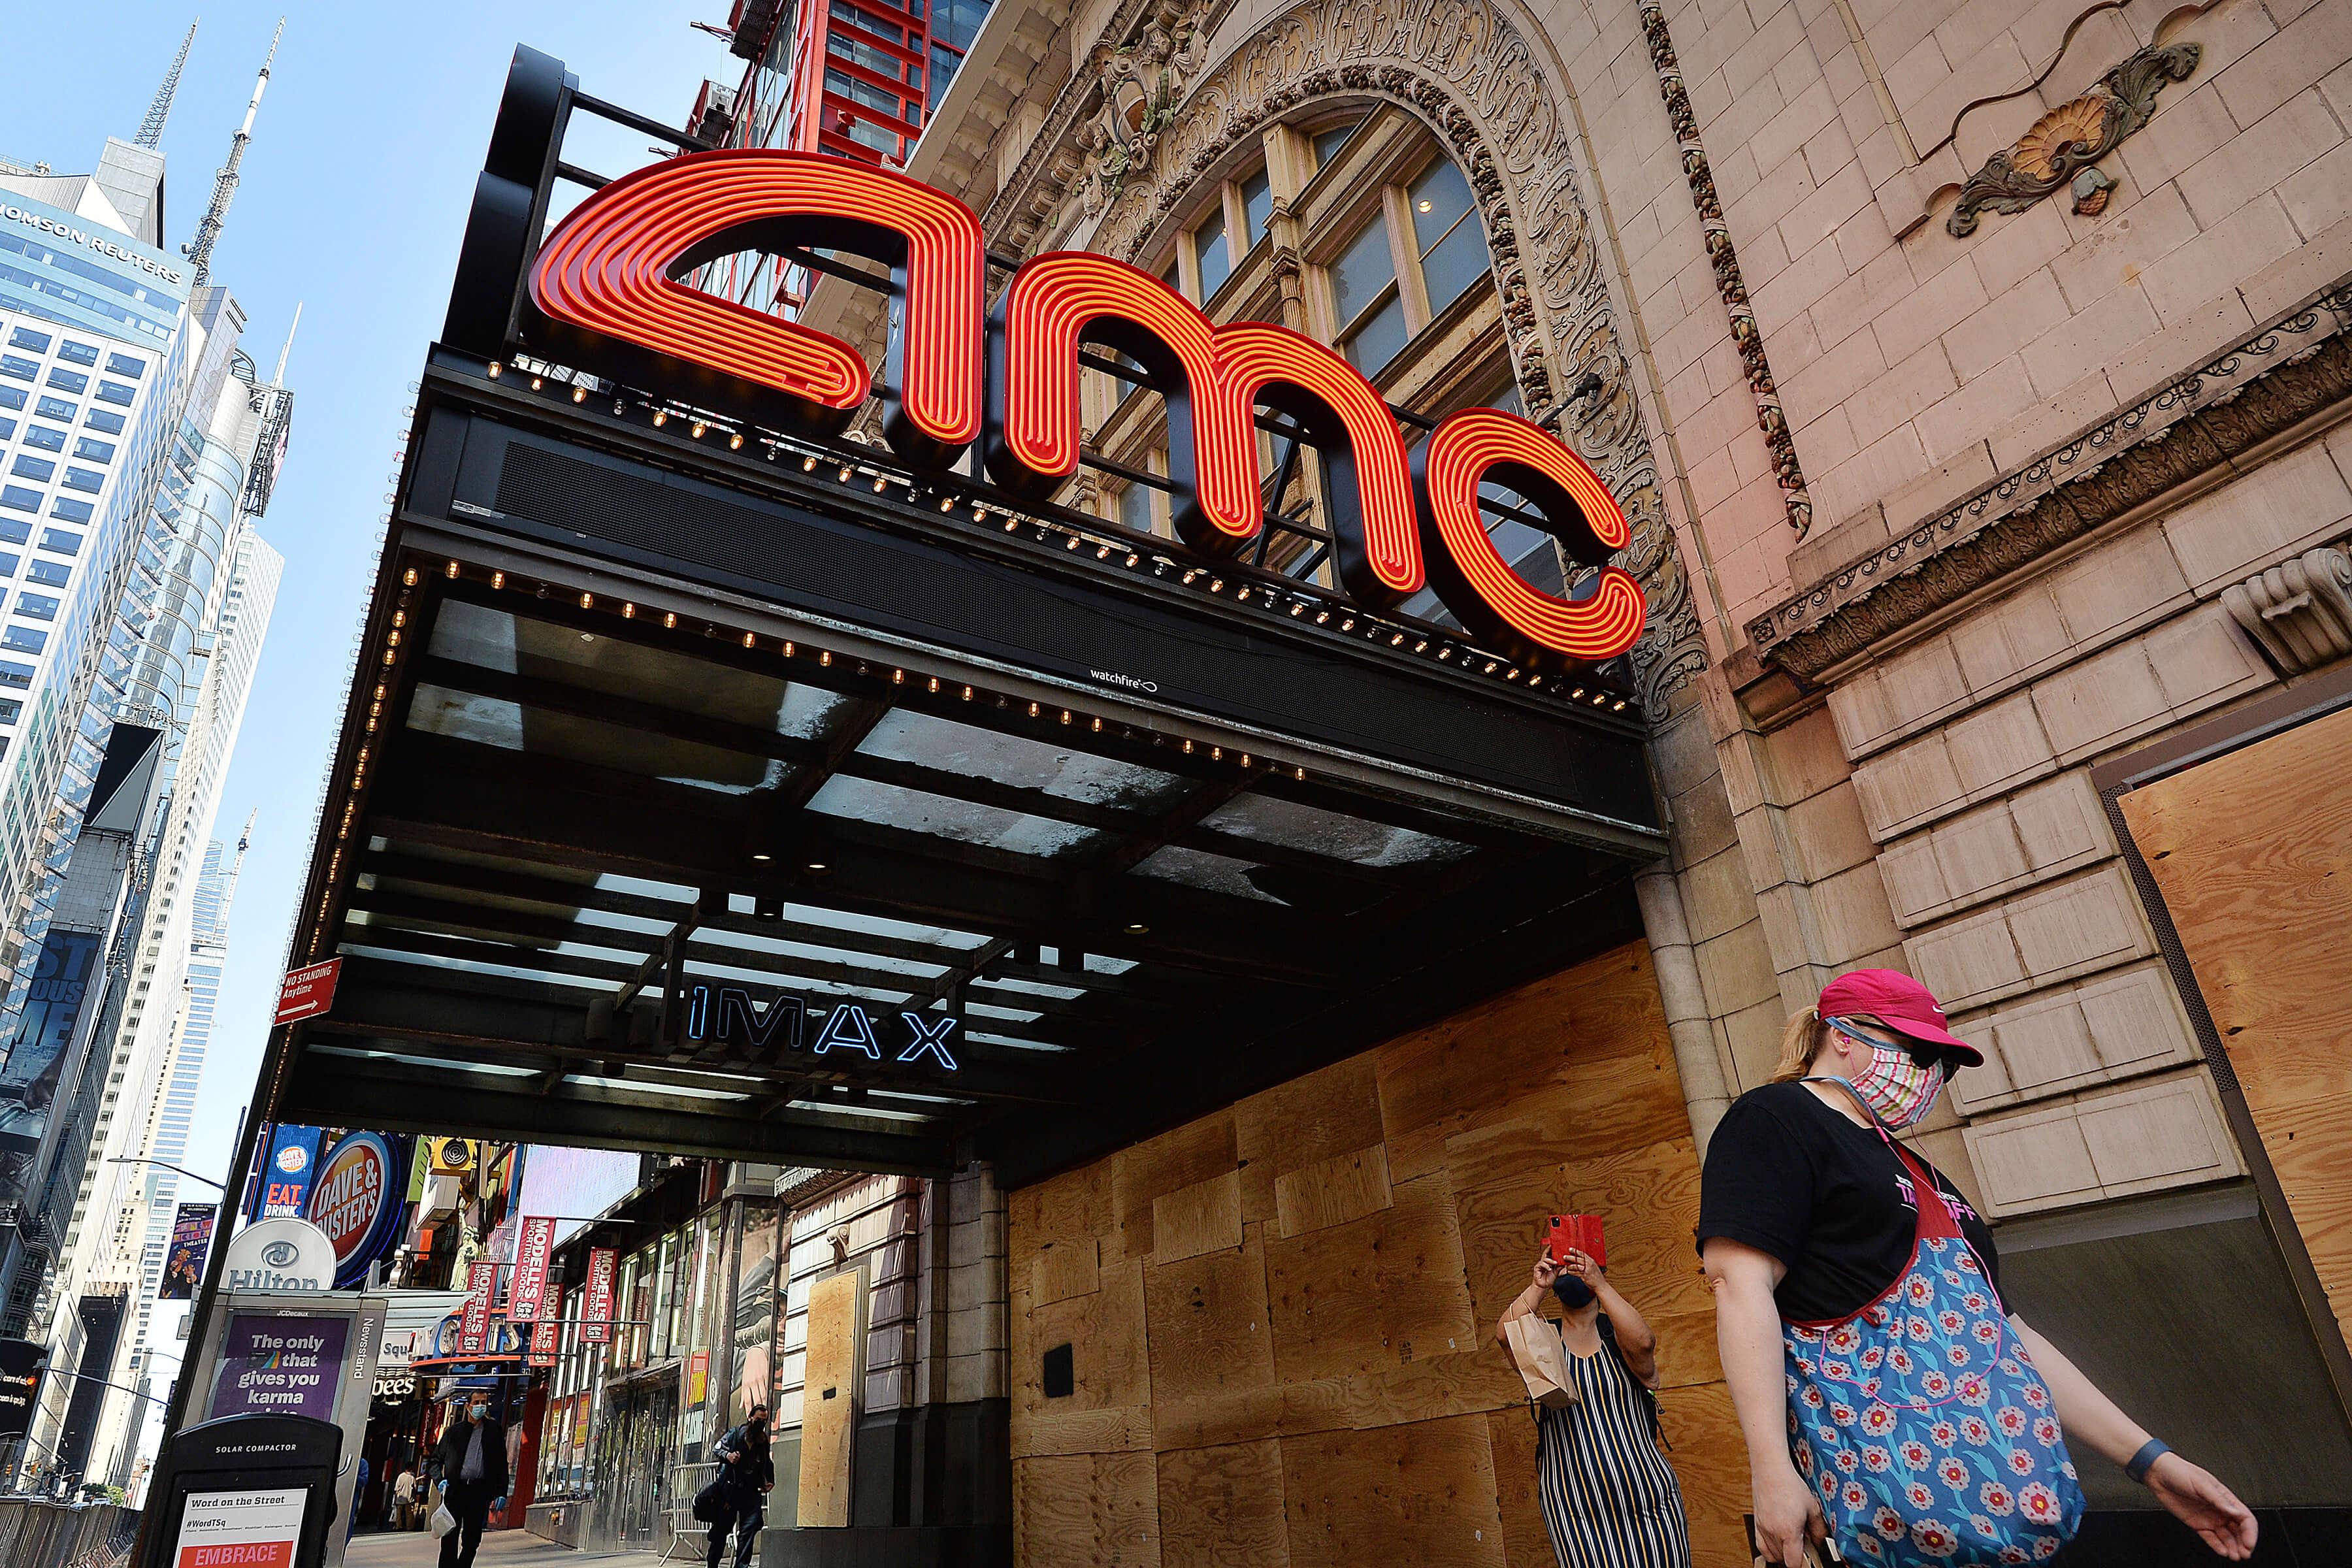 NY: AMC Entertainment Holdings Records $2.2 Billion Net Loss - Rubic.us